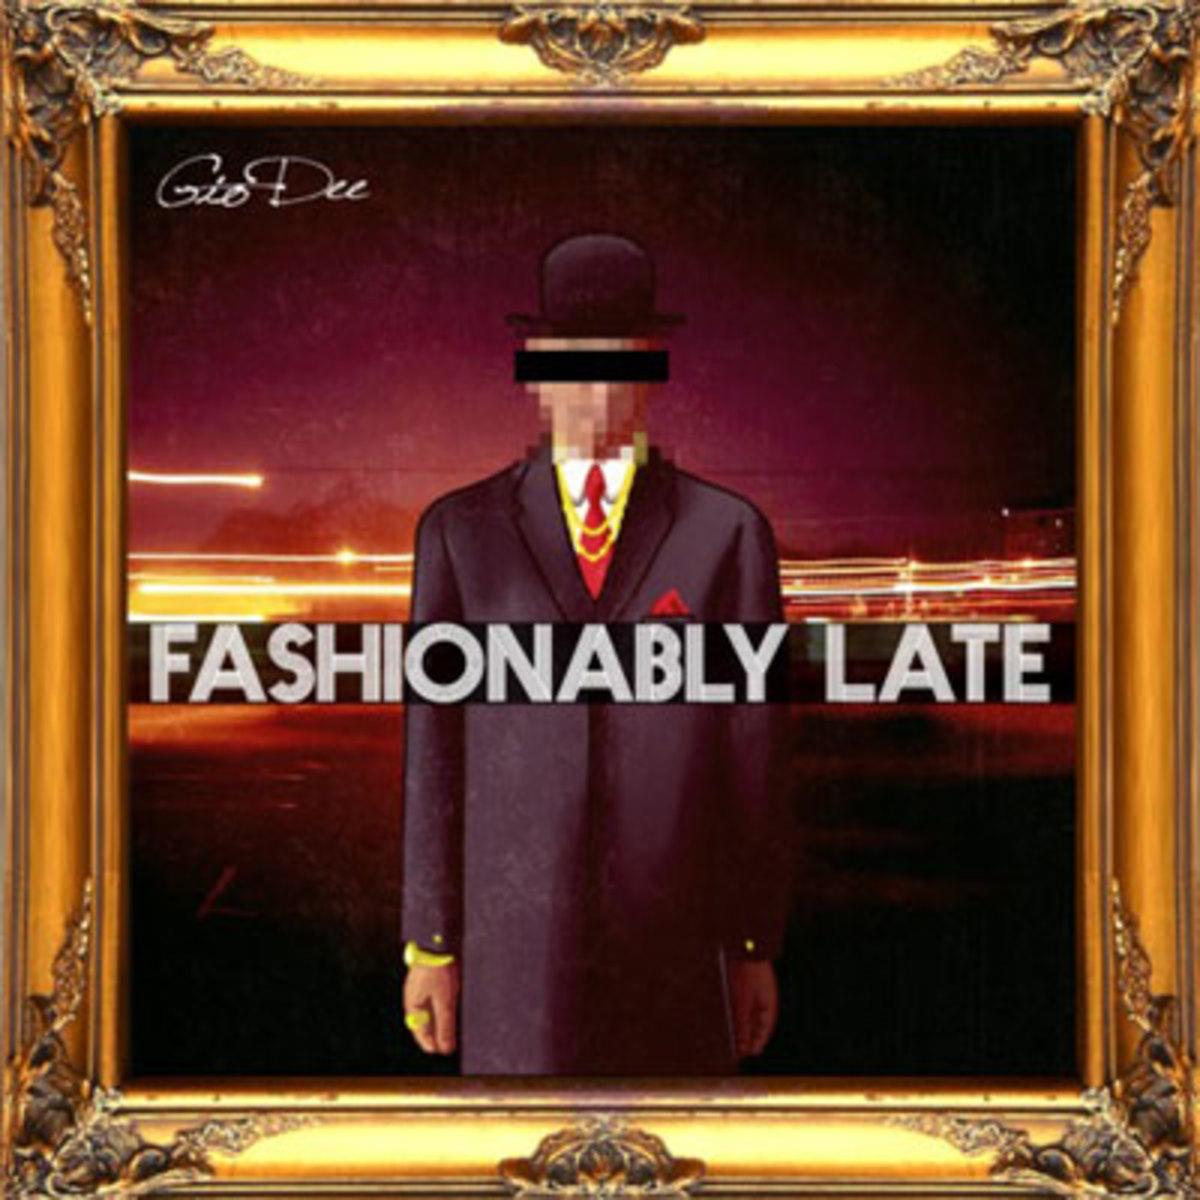 giodee-fashionablylate.jpg